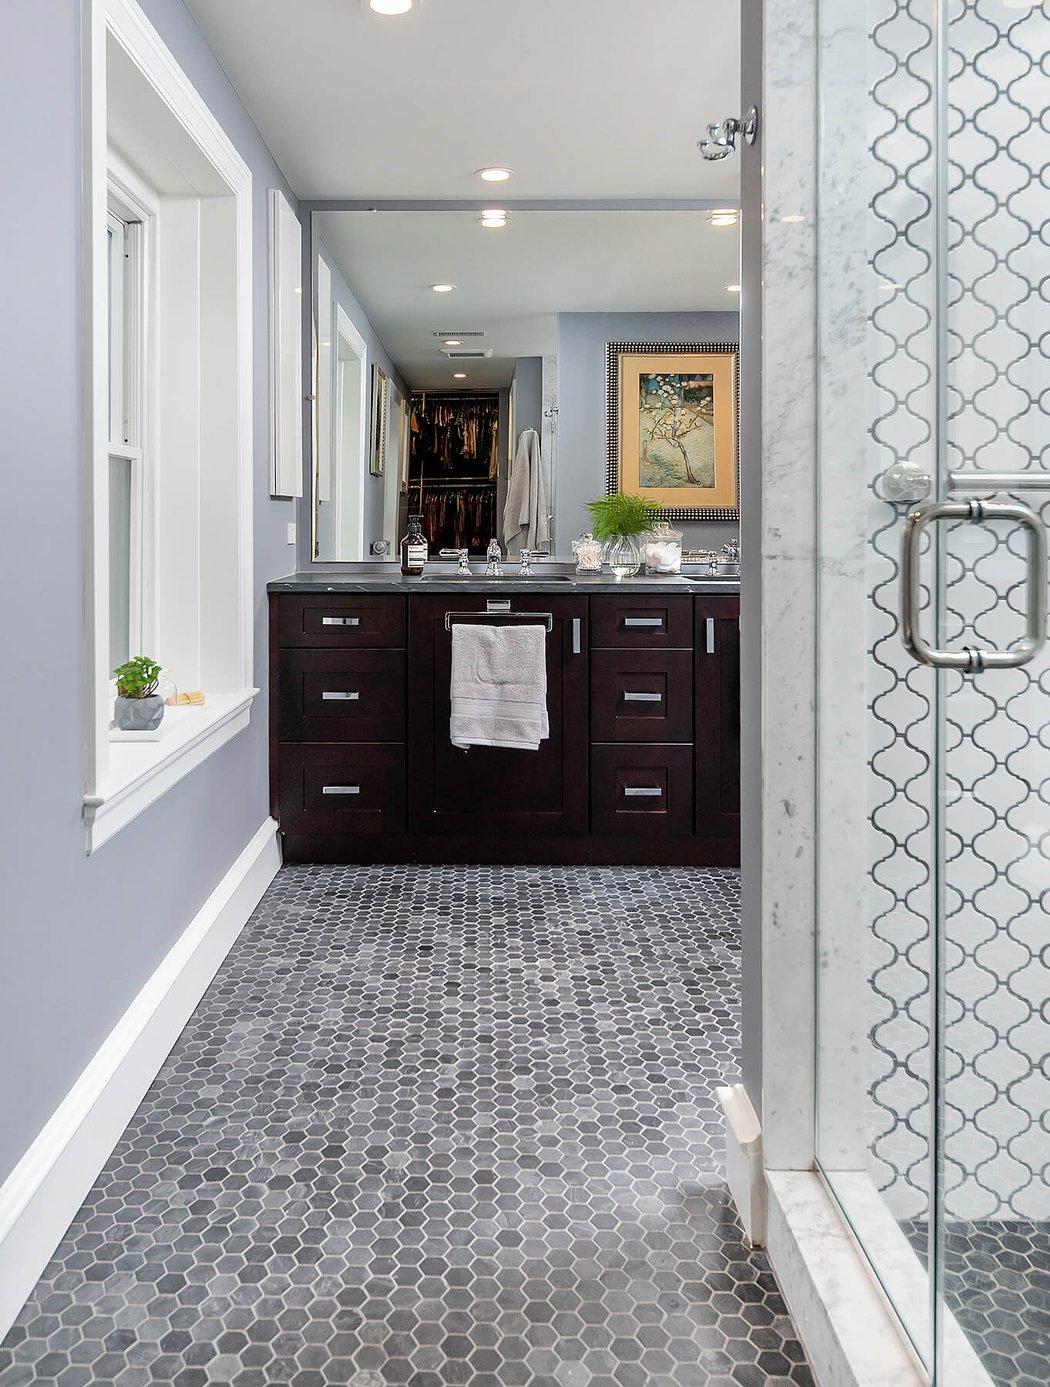 Hexagon-Tiled Bathroom Featuring Gray Tones